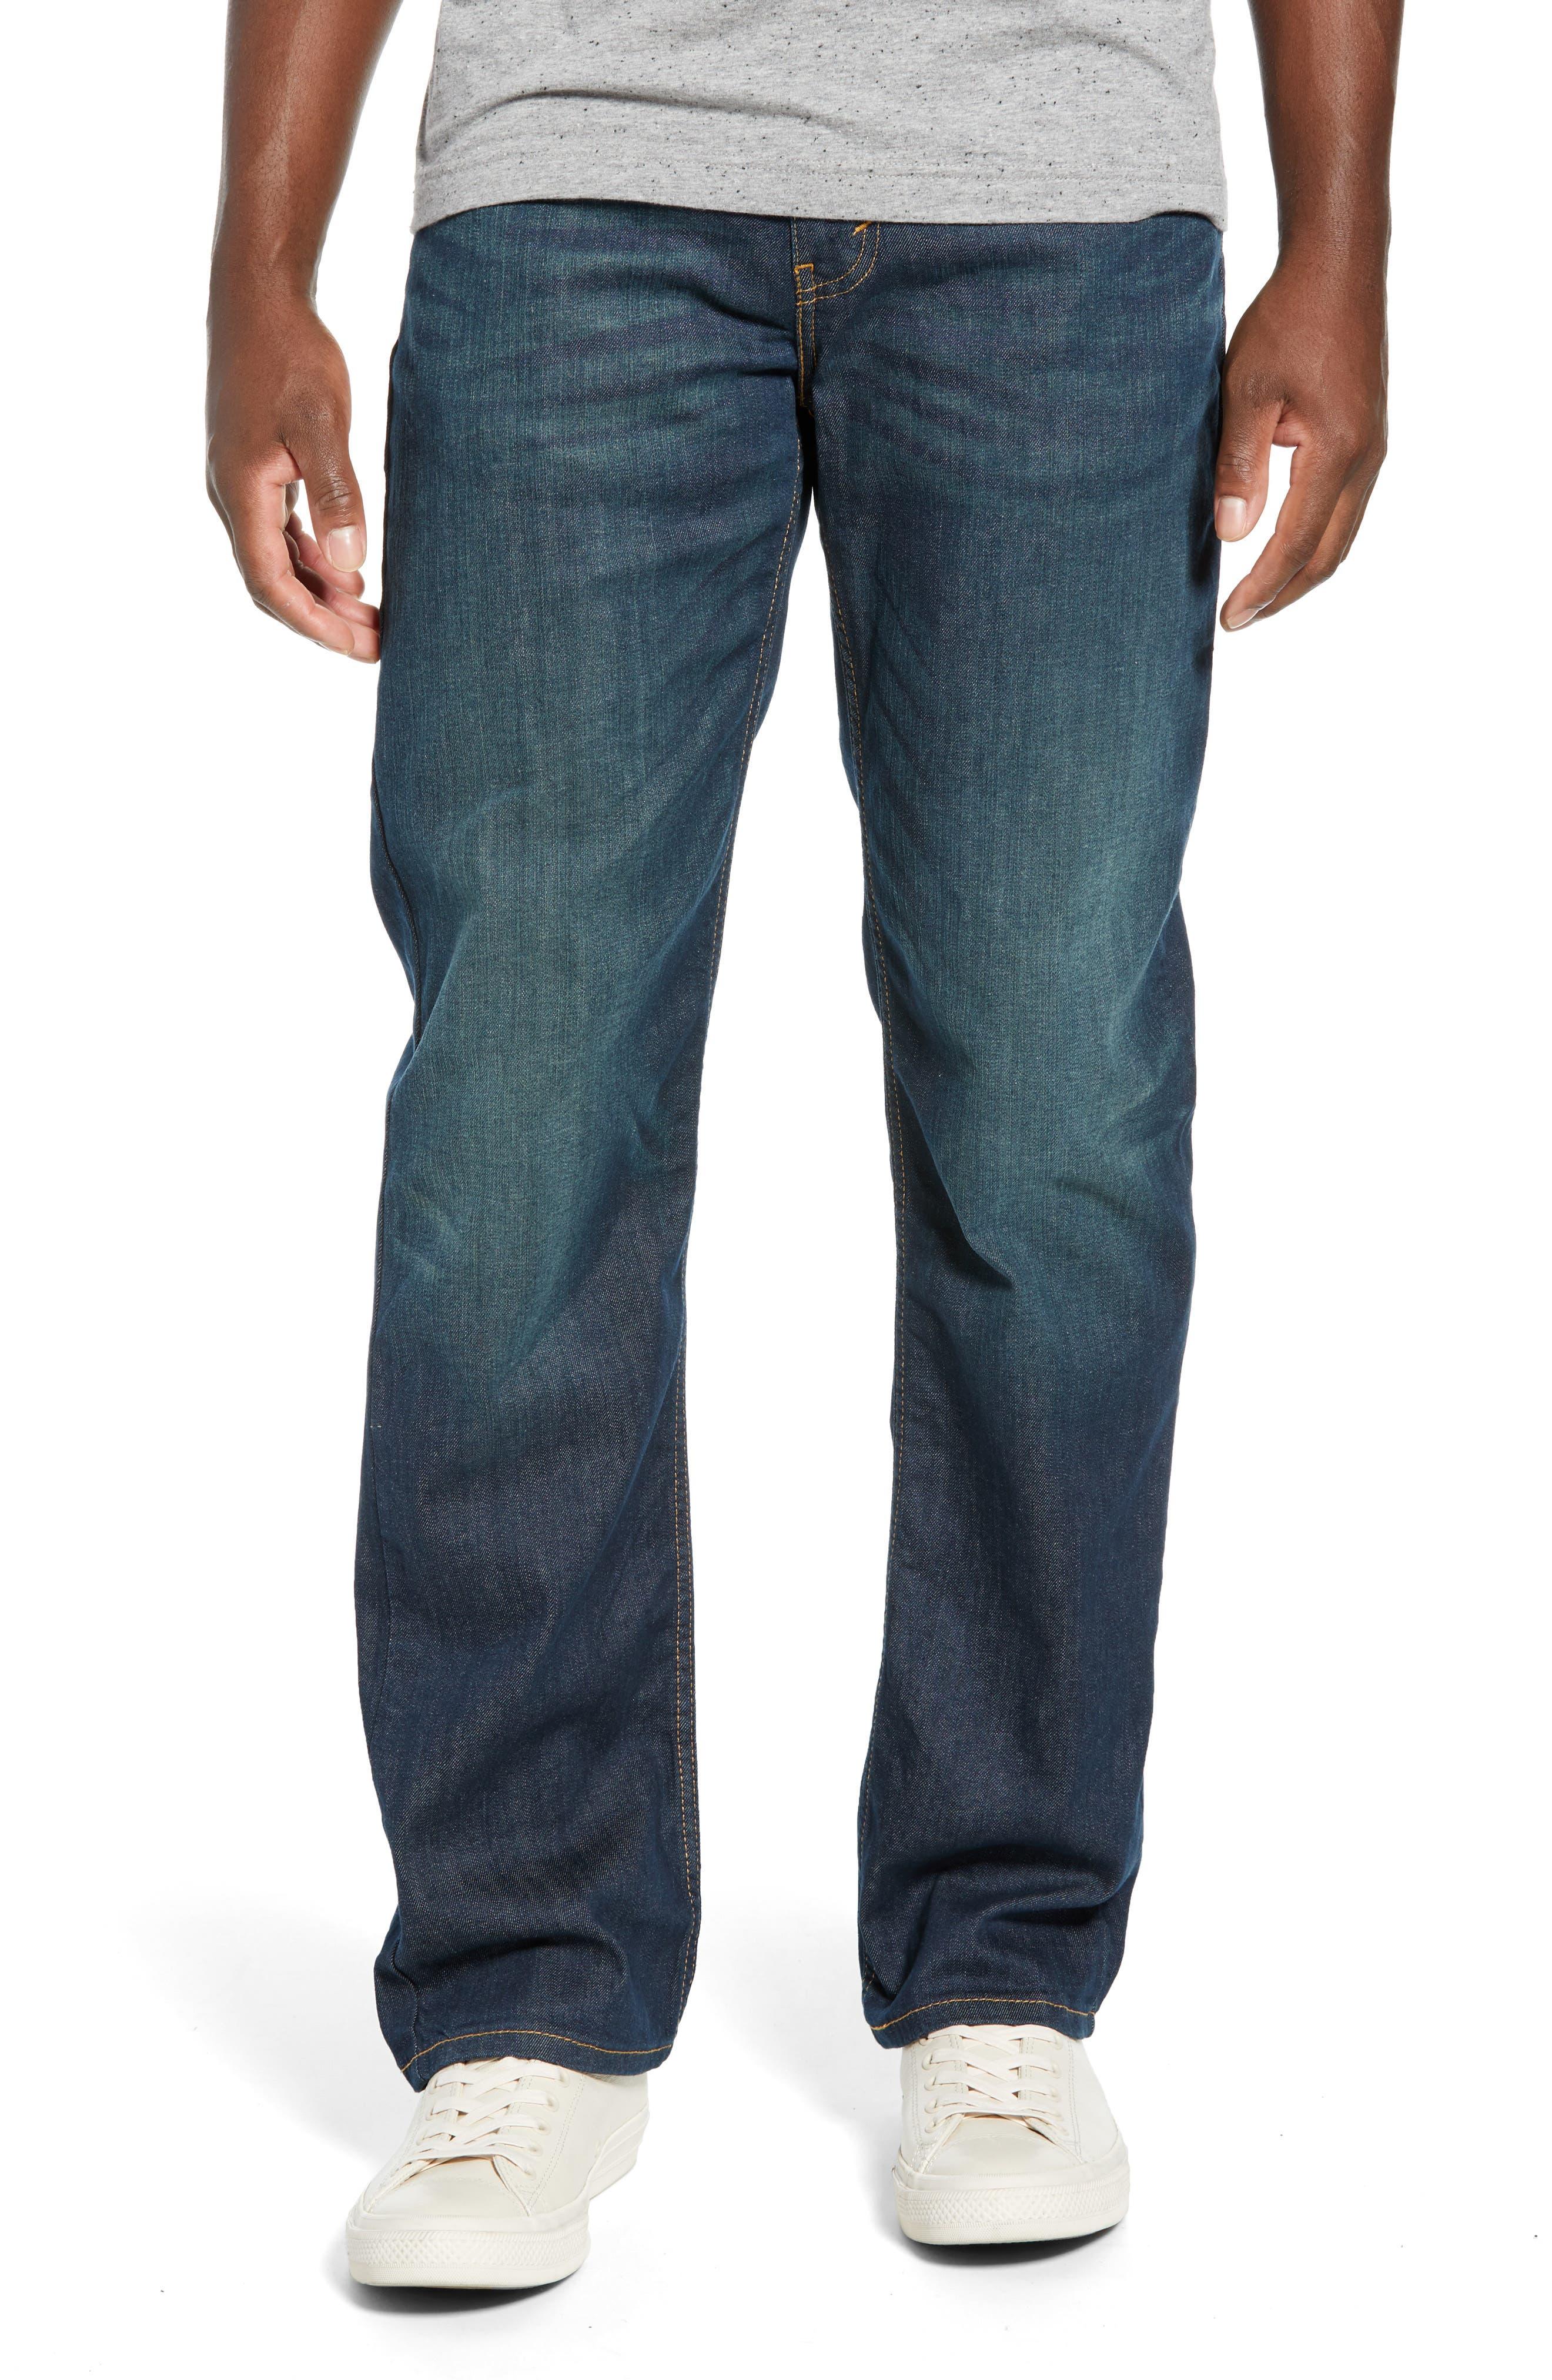 Men's Levi's 514(TM) Straight Leg Jeans,  28 x 30 - Blue